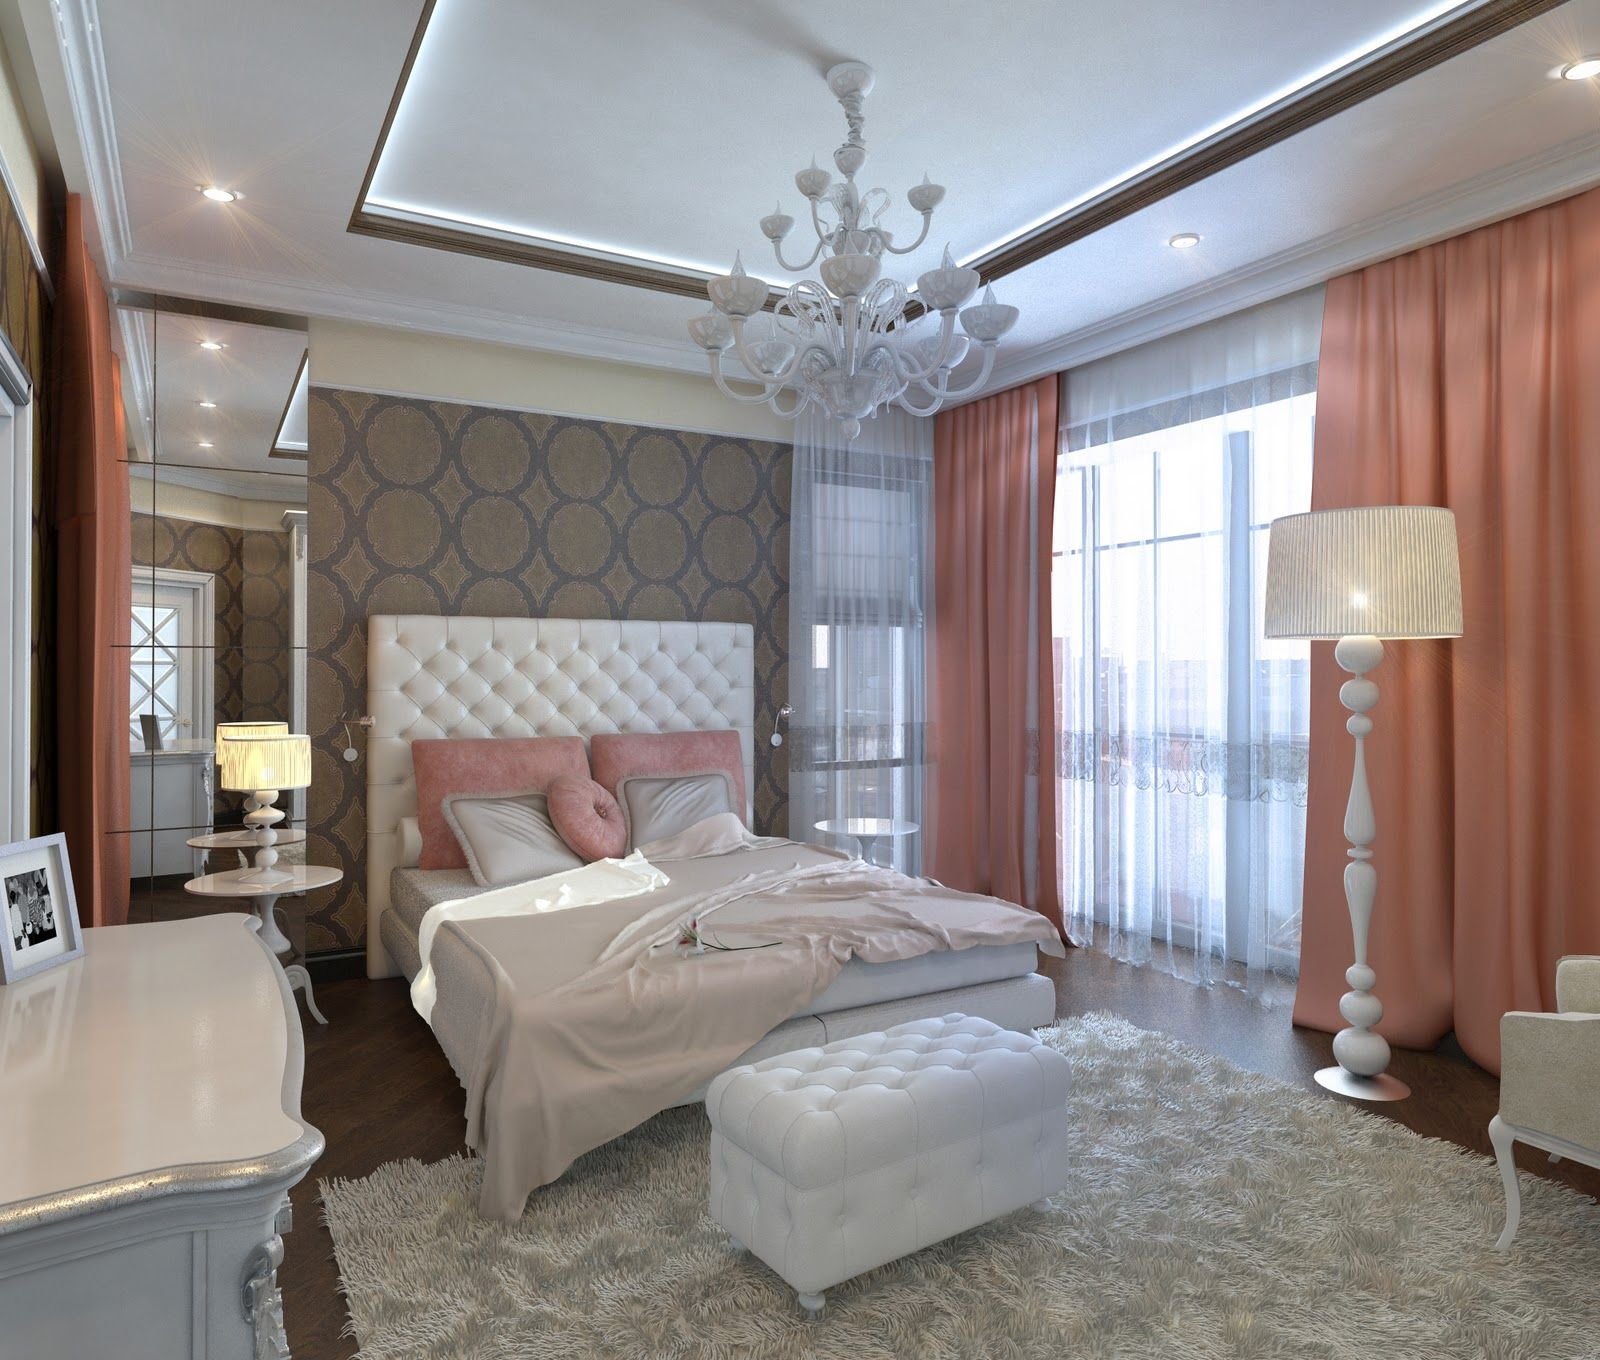 art of bedroom | design ideas 2017-2018 | Pinterest | Art deco ...